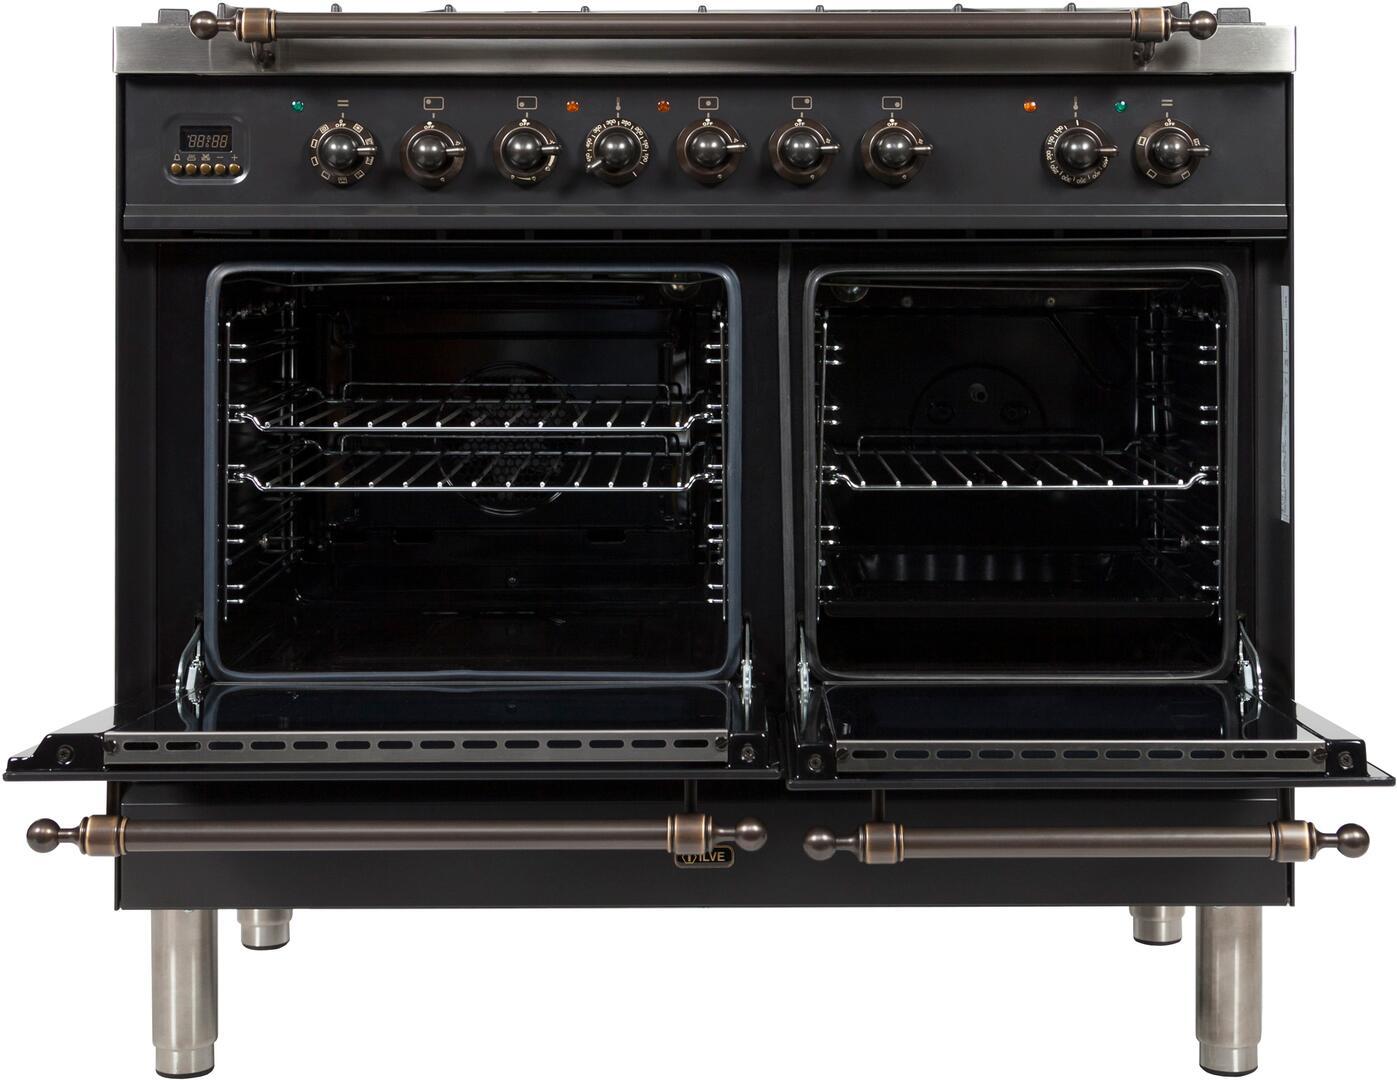 Ilve Nostalgie UPDN100FDMPMY Freestanding Dual Fuel Range Slate, UPDN100FDMPMY Oven Doors Opened